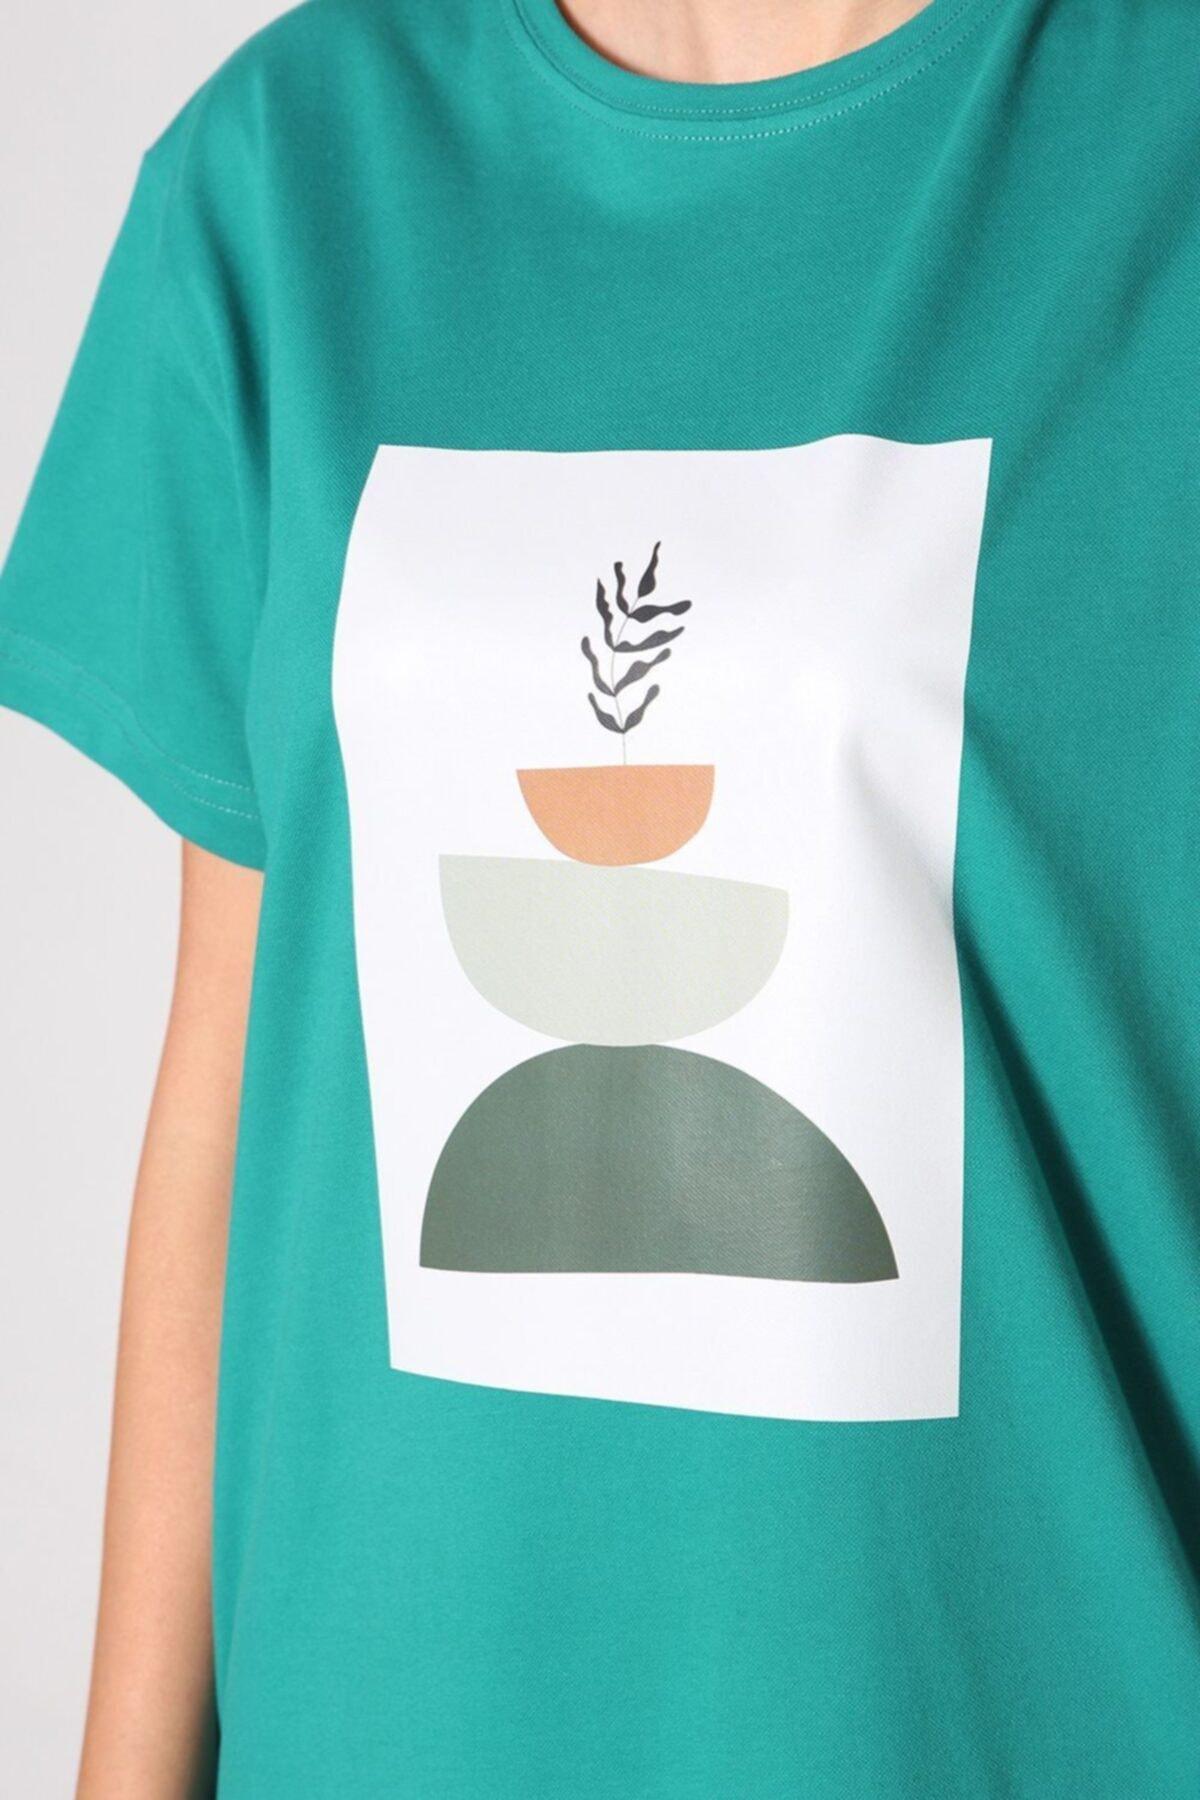 ALLDAY Zümrüt Baskılı Kısa Kol T-shirt 1